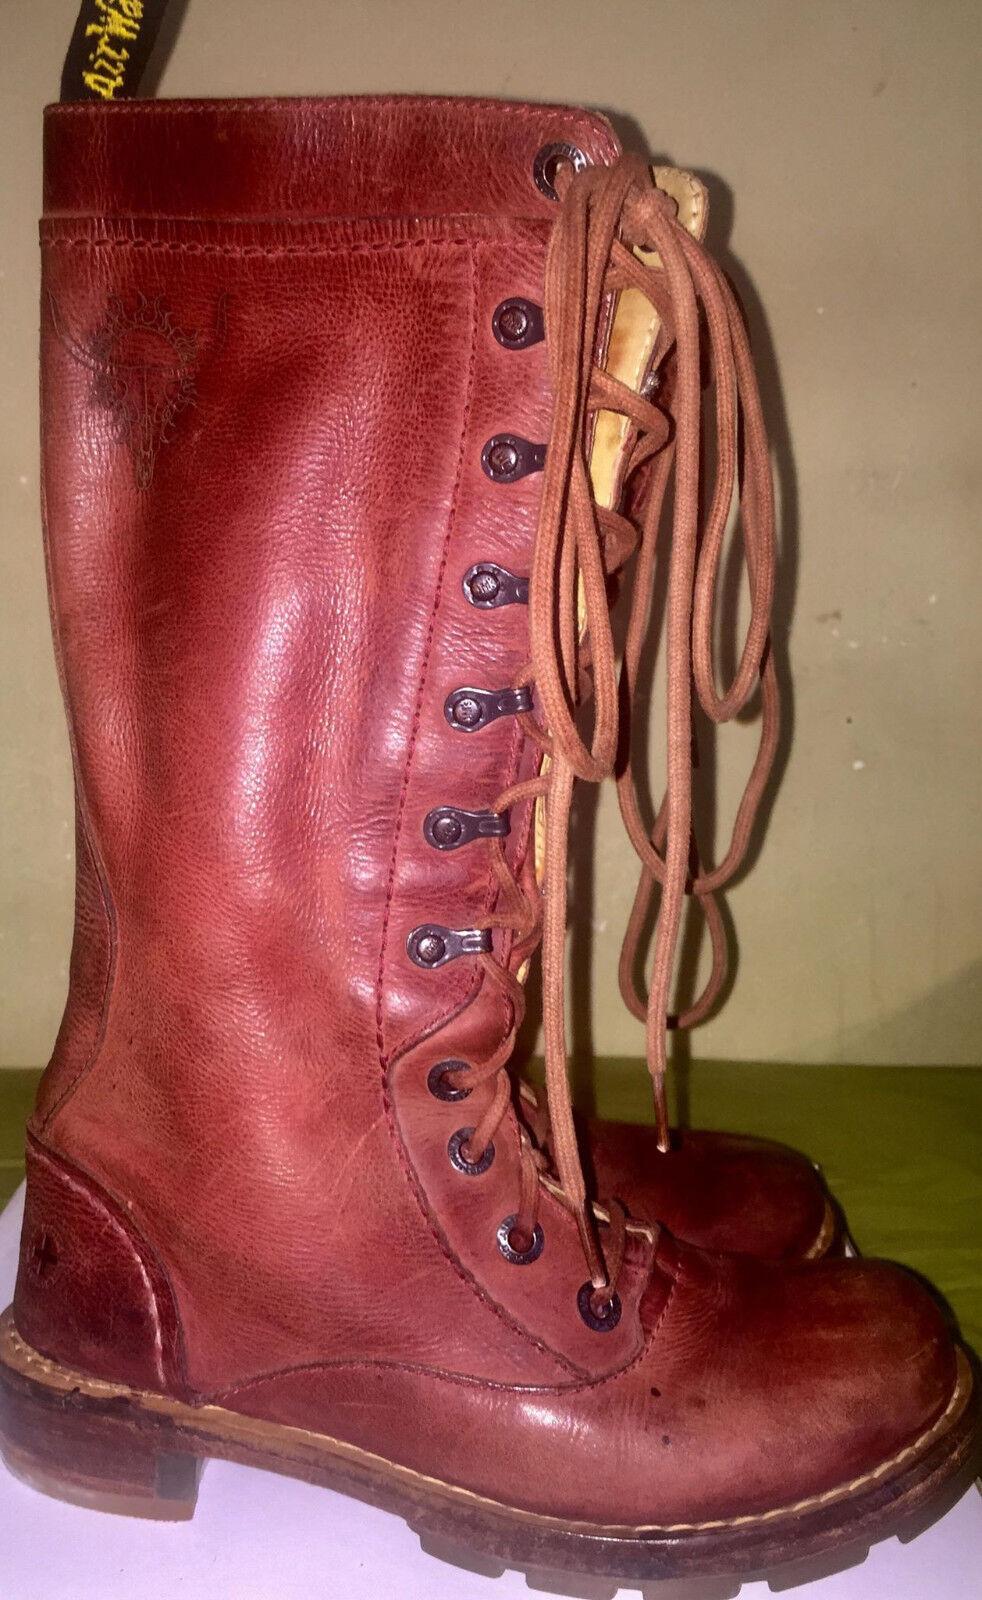 Unique Vintage Dr Martens Cross DMs Leather Zip stivali Bull Skull Stigma sz US 6